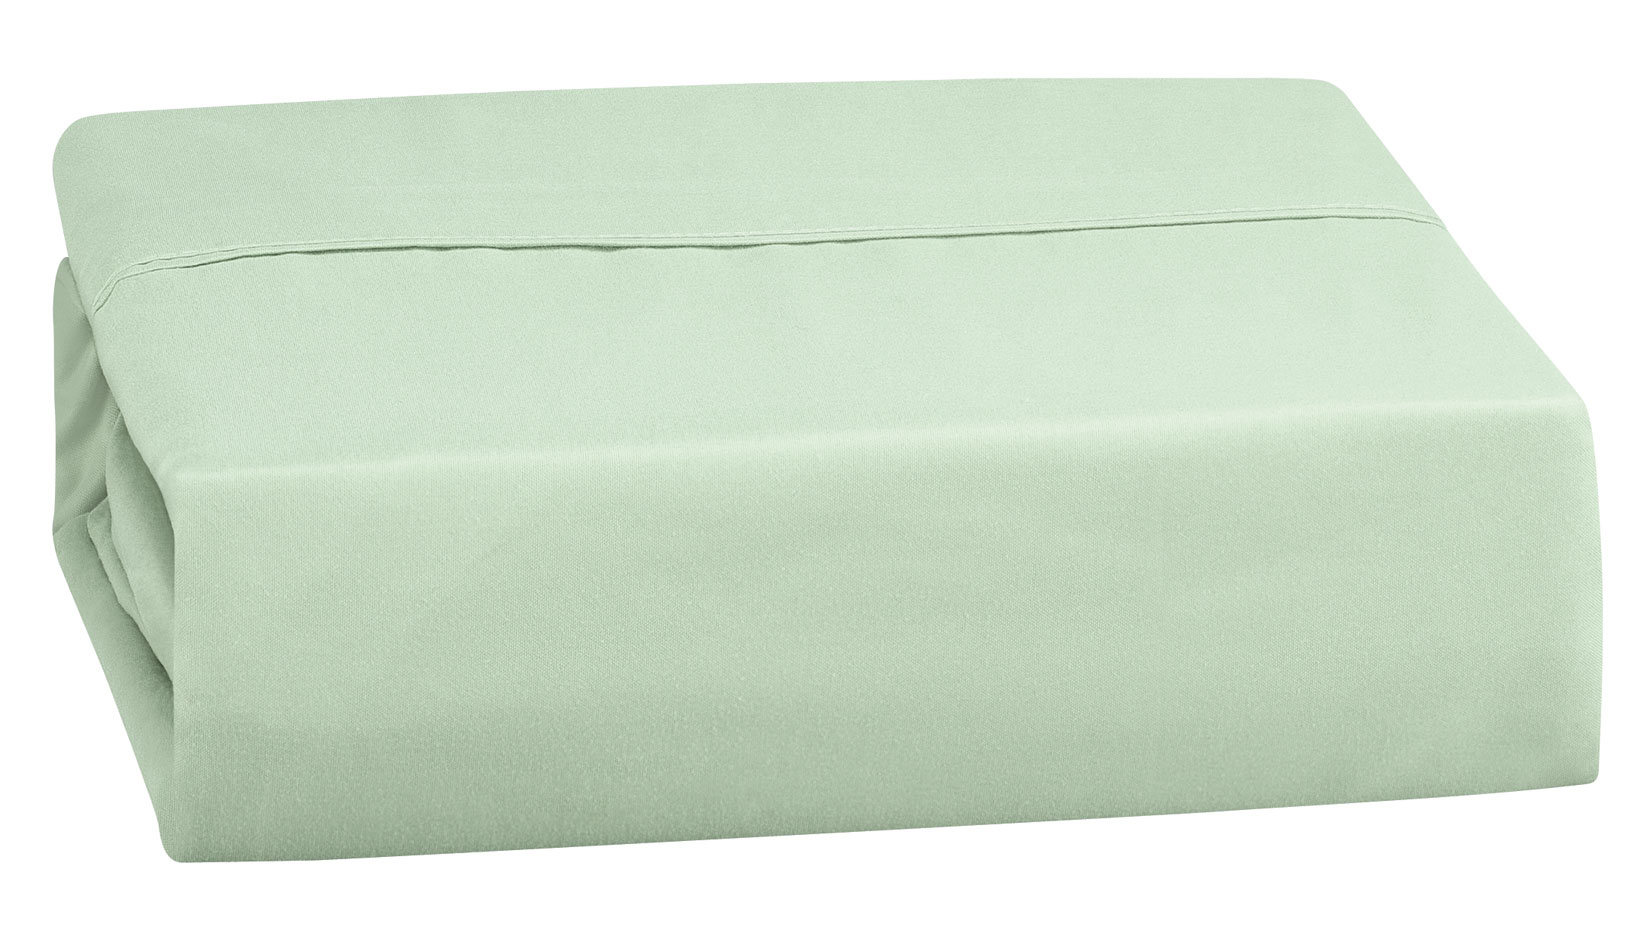 Luxurious-Microfiber-Sheet-Set thumbnail 3